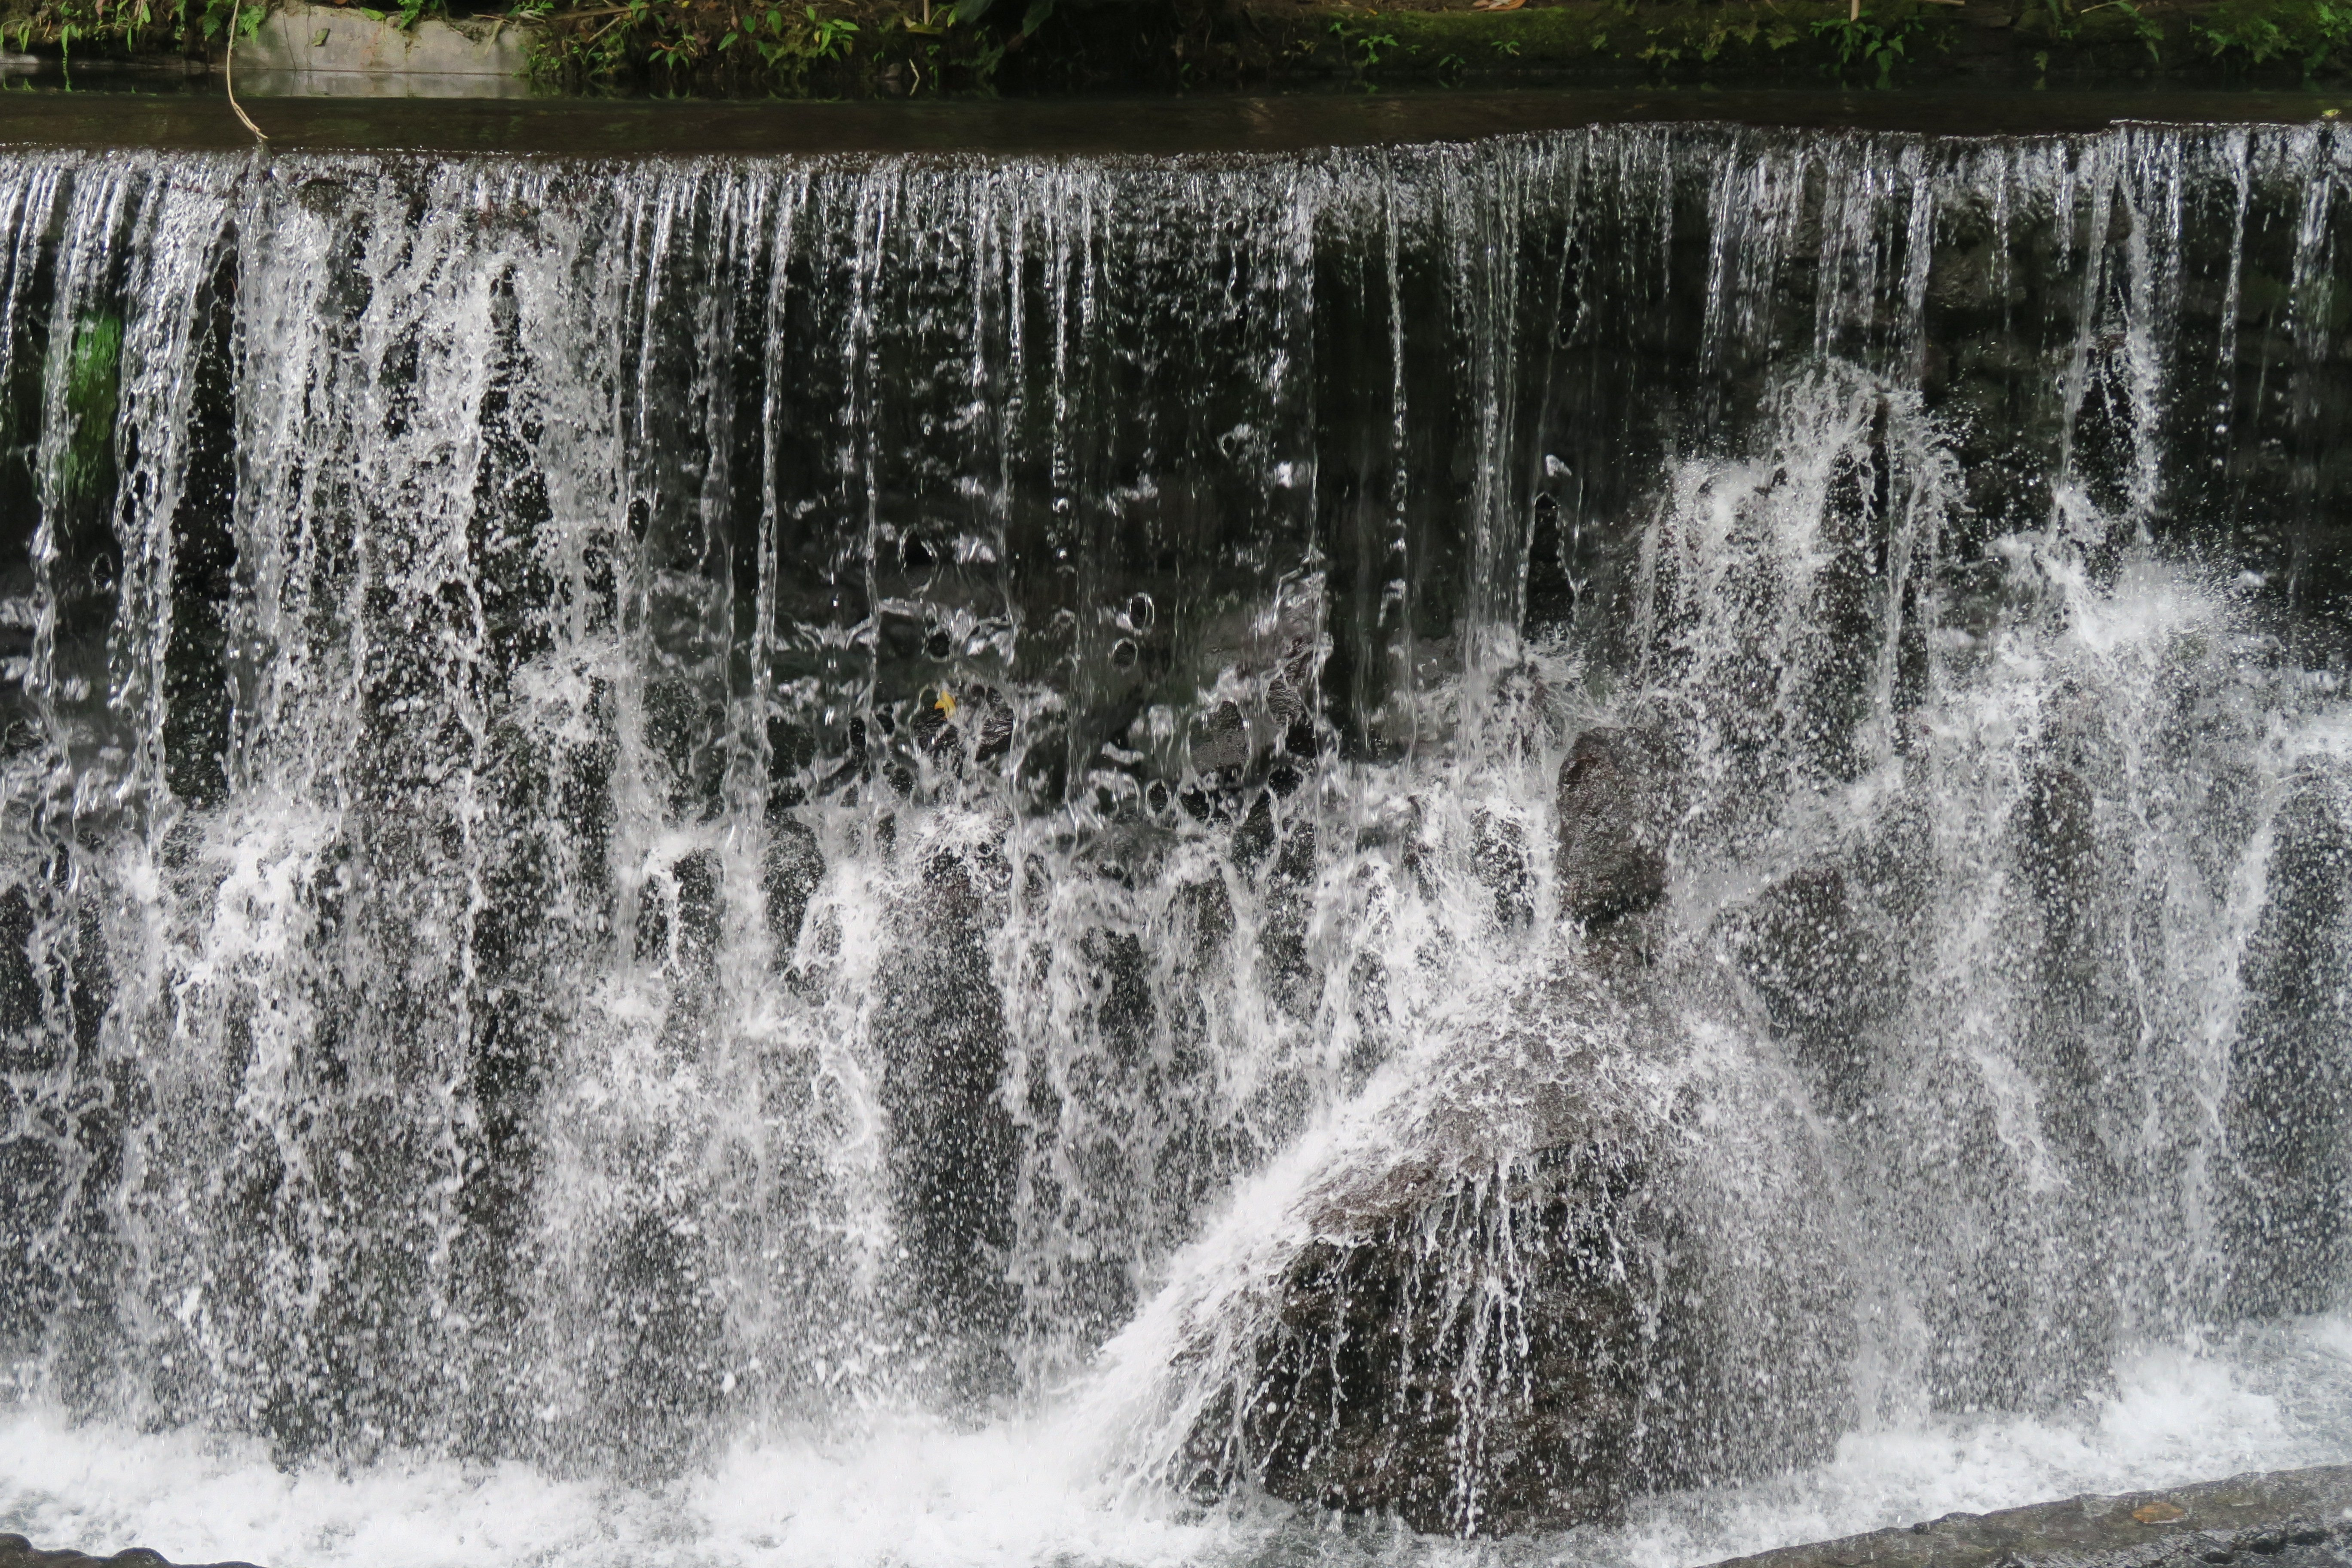 Mini-Falls in Bato Springs Resort